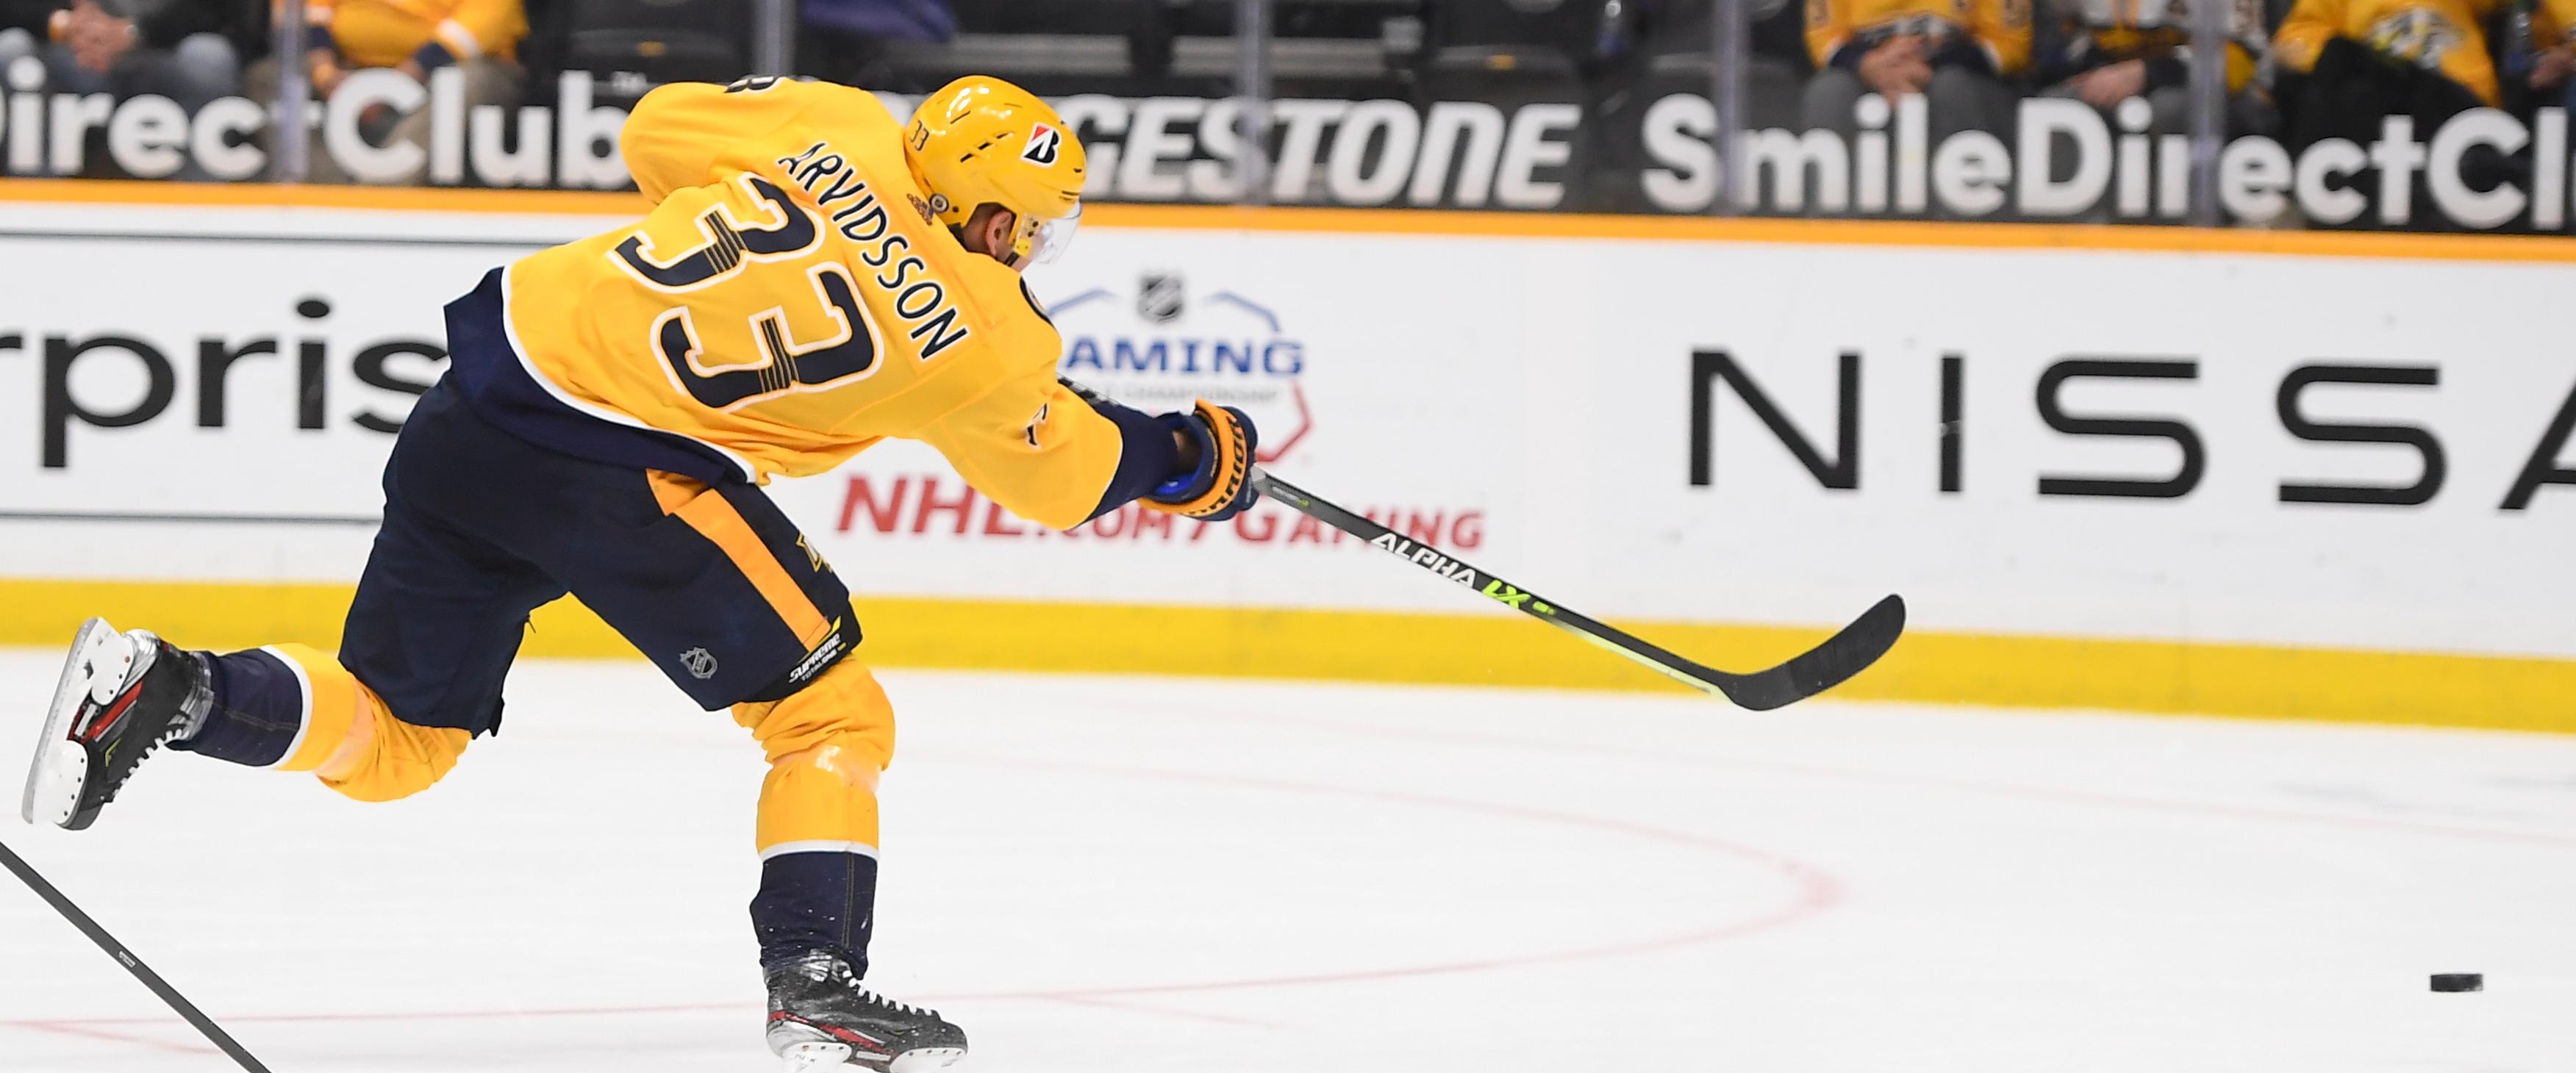 Bittersweet day: The Predators trade Viktor Arvidsson to the LA Kings